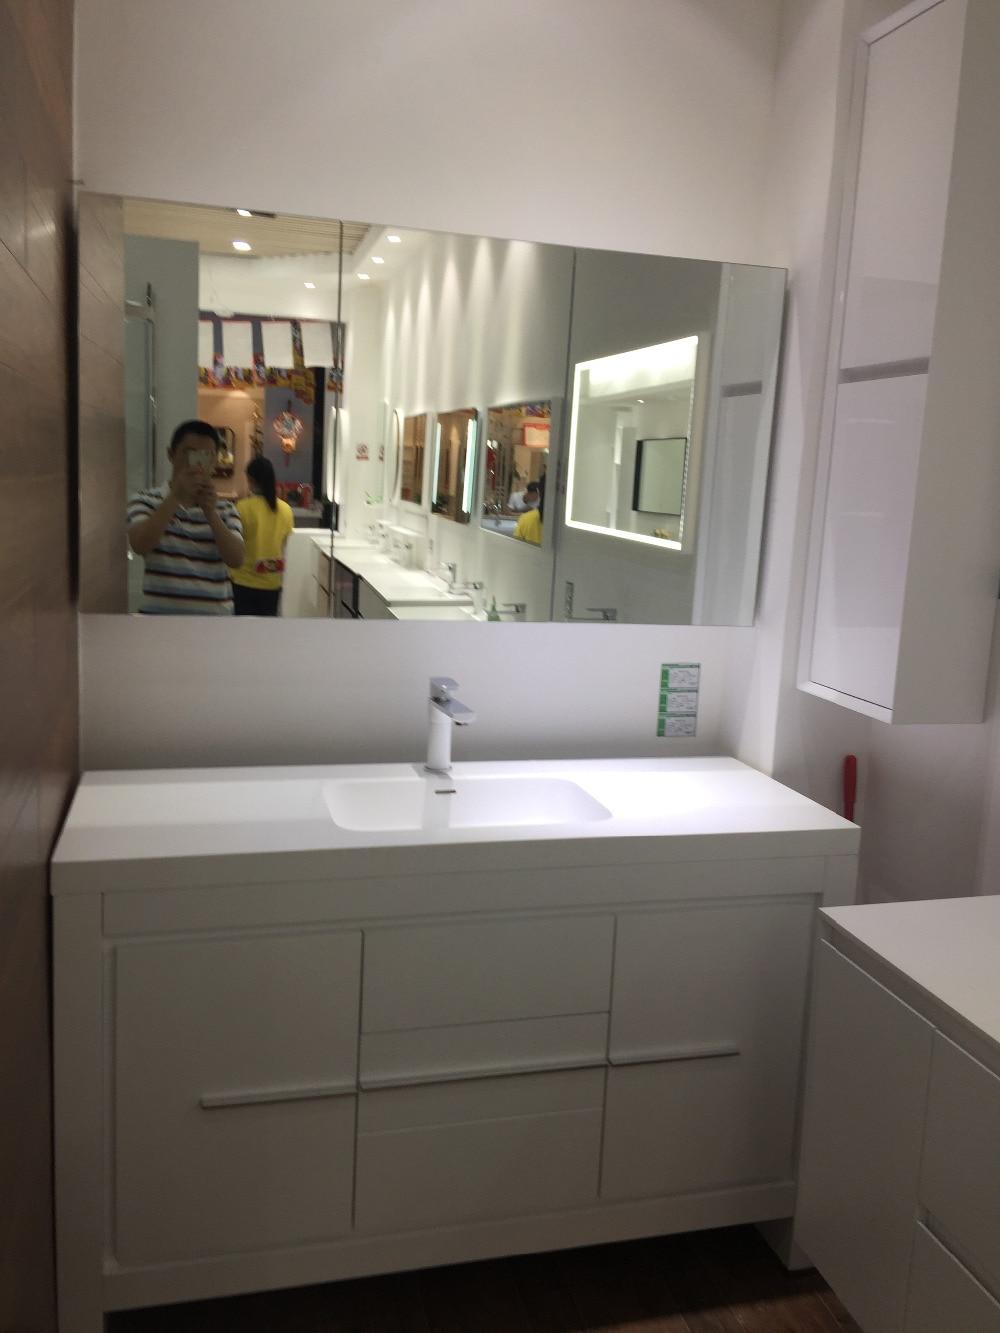 1300mm Floor Mounted Solid Surface Acrylic Furniture Oak Wood Bathroom Vanity Cabinet Cloakroom Matt White Sink 2193 0